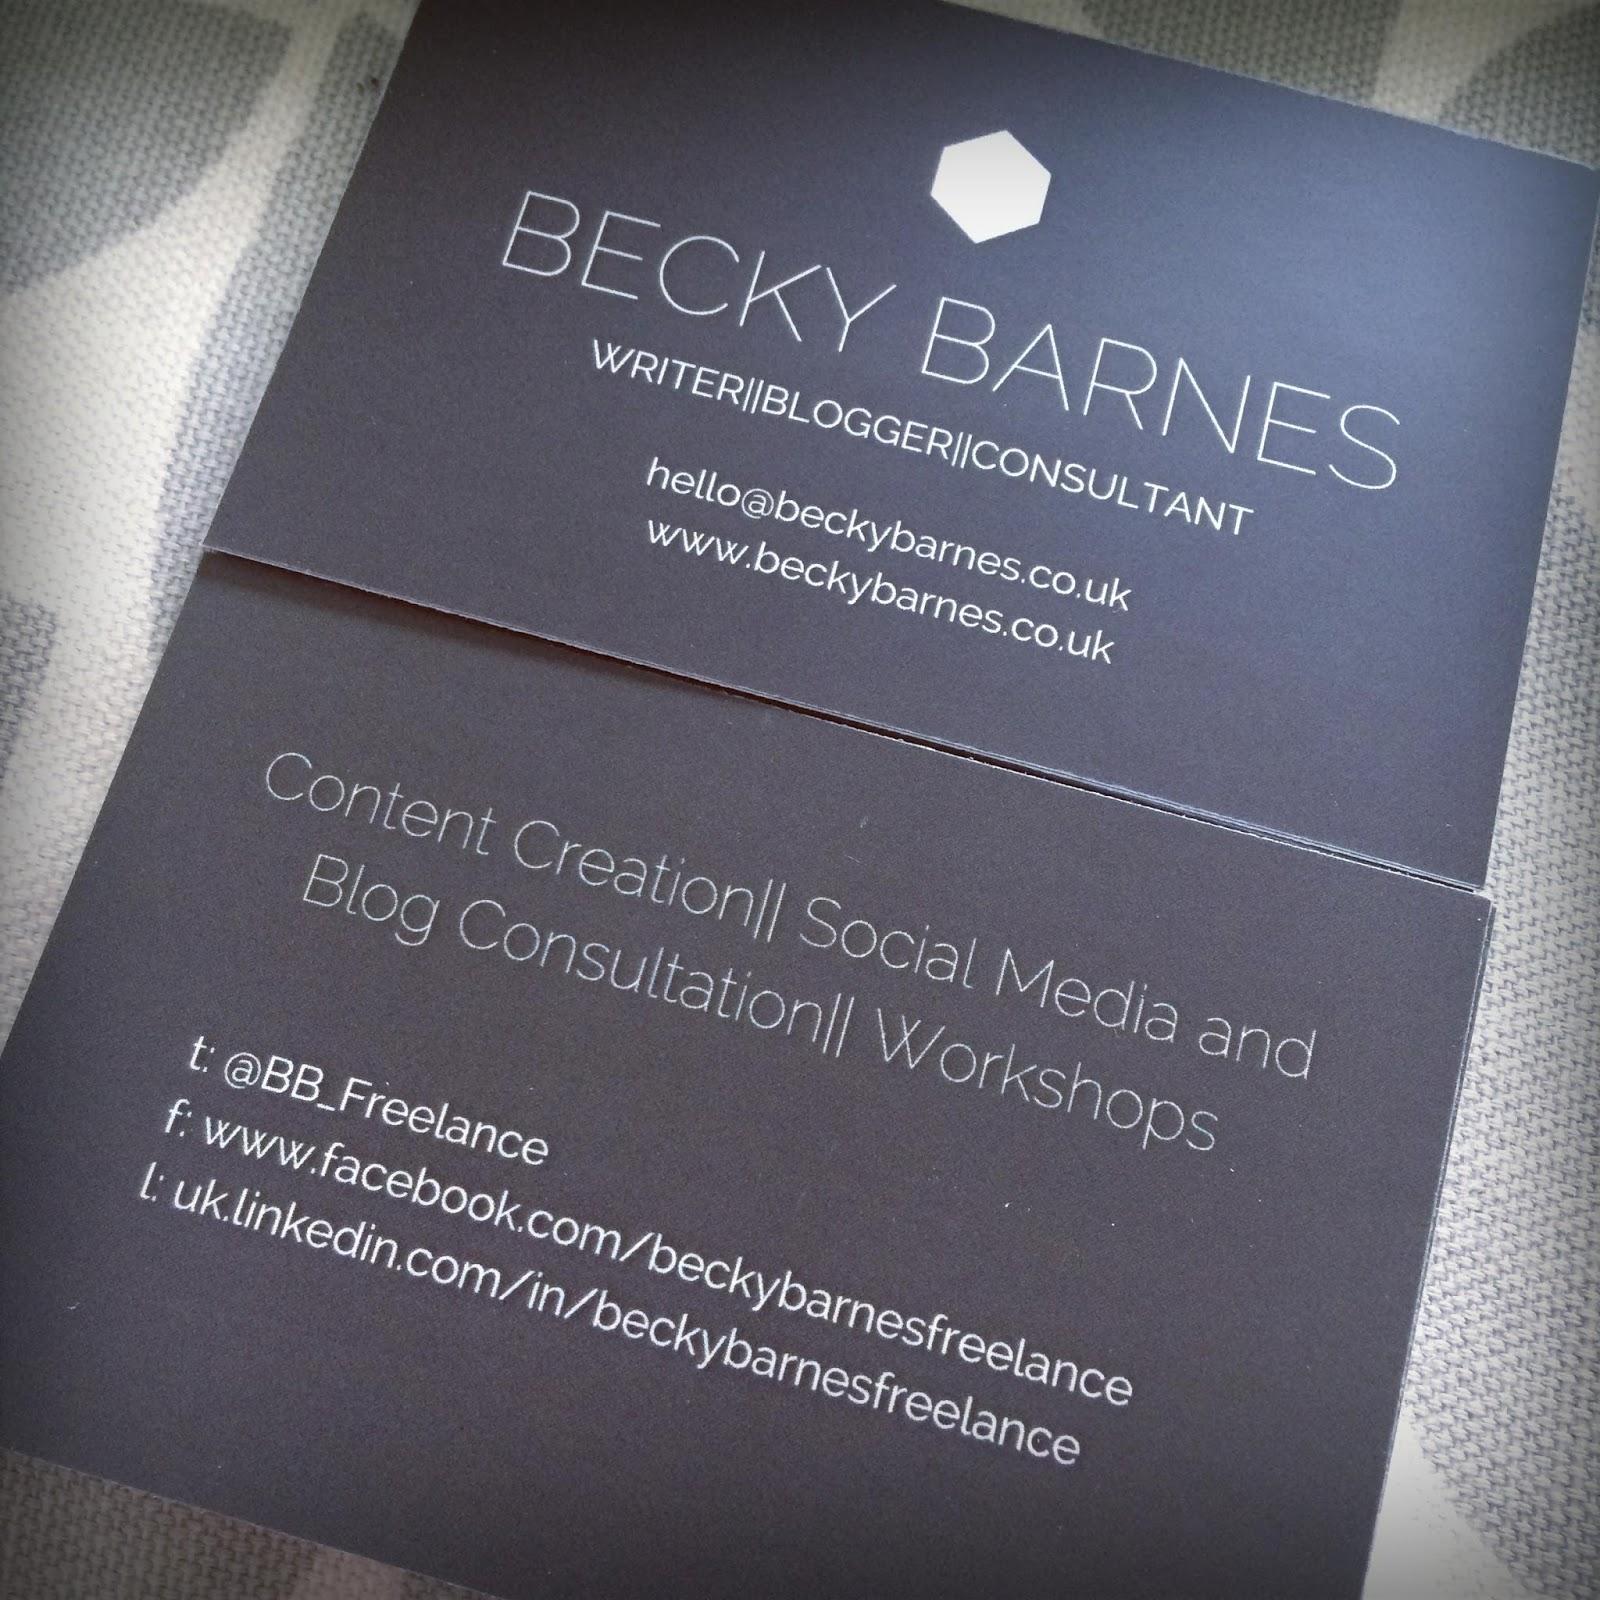 becky barnes blog